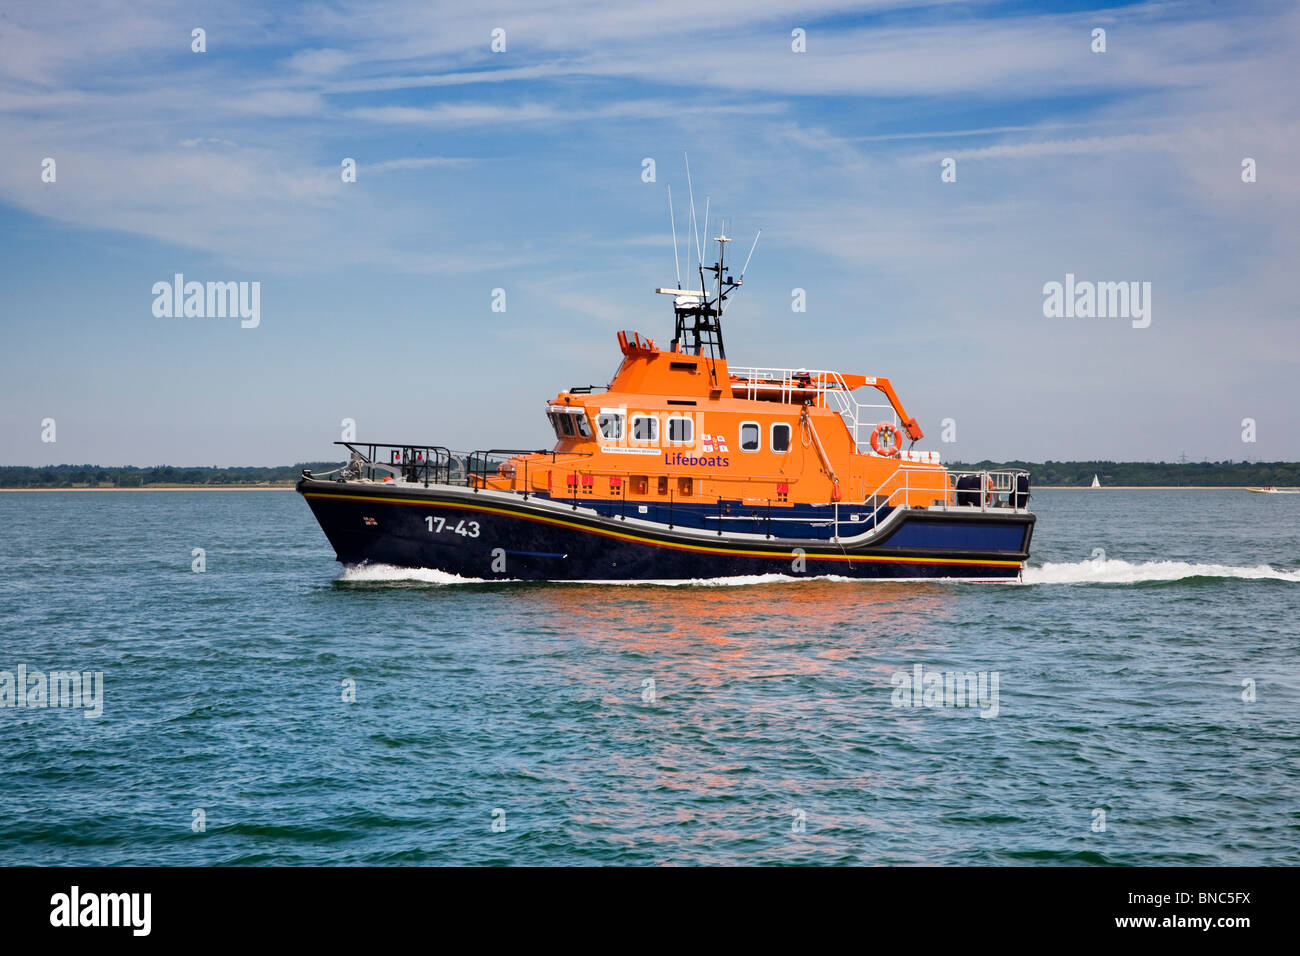 RNLI Severn Class Lifeboat '17-43' RNLB DONALD & BARBARA BROADHEAD - Stock Image